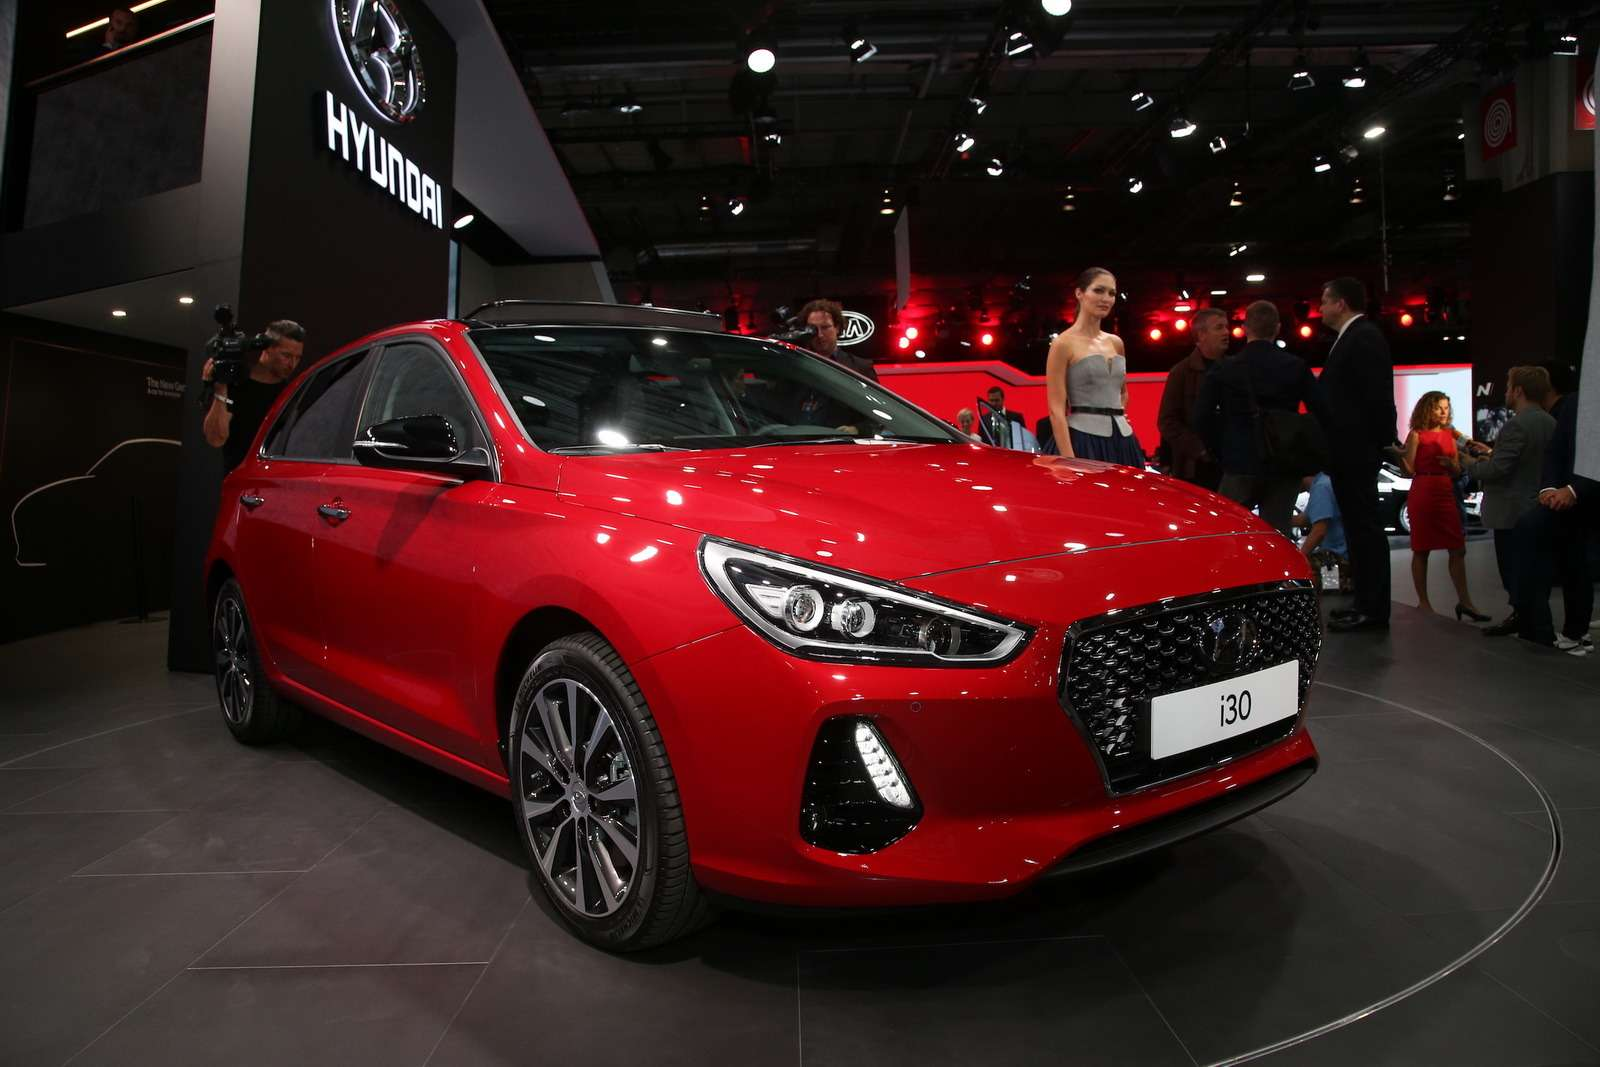 В тени концепта: вПариже дебютировал новый Hyundai i30— фото 642326